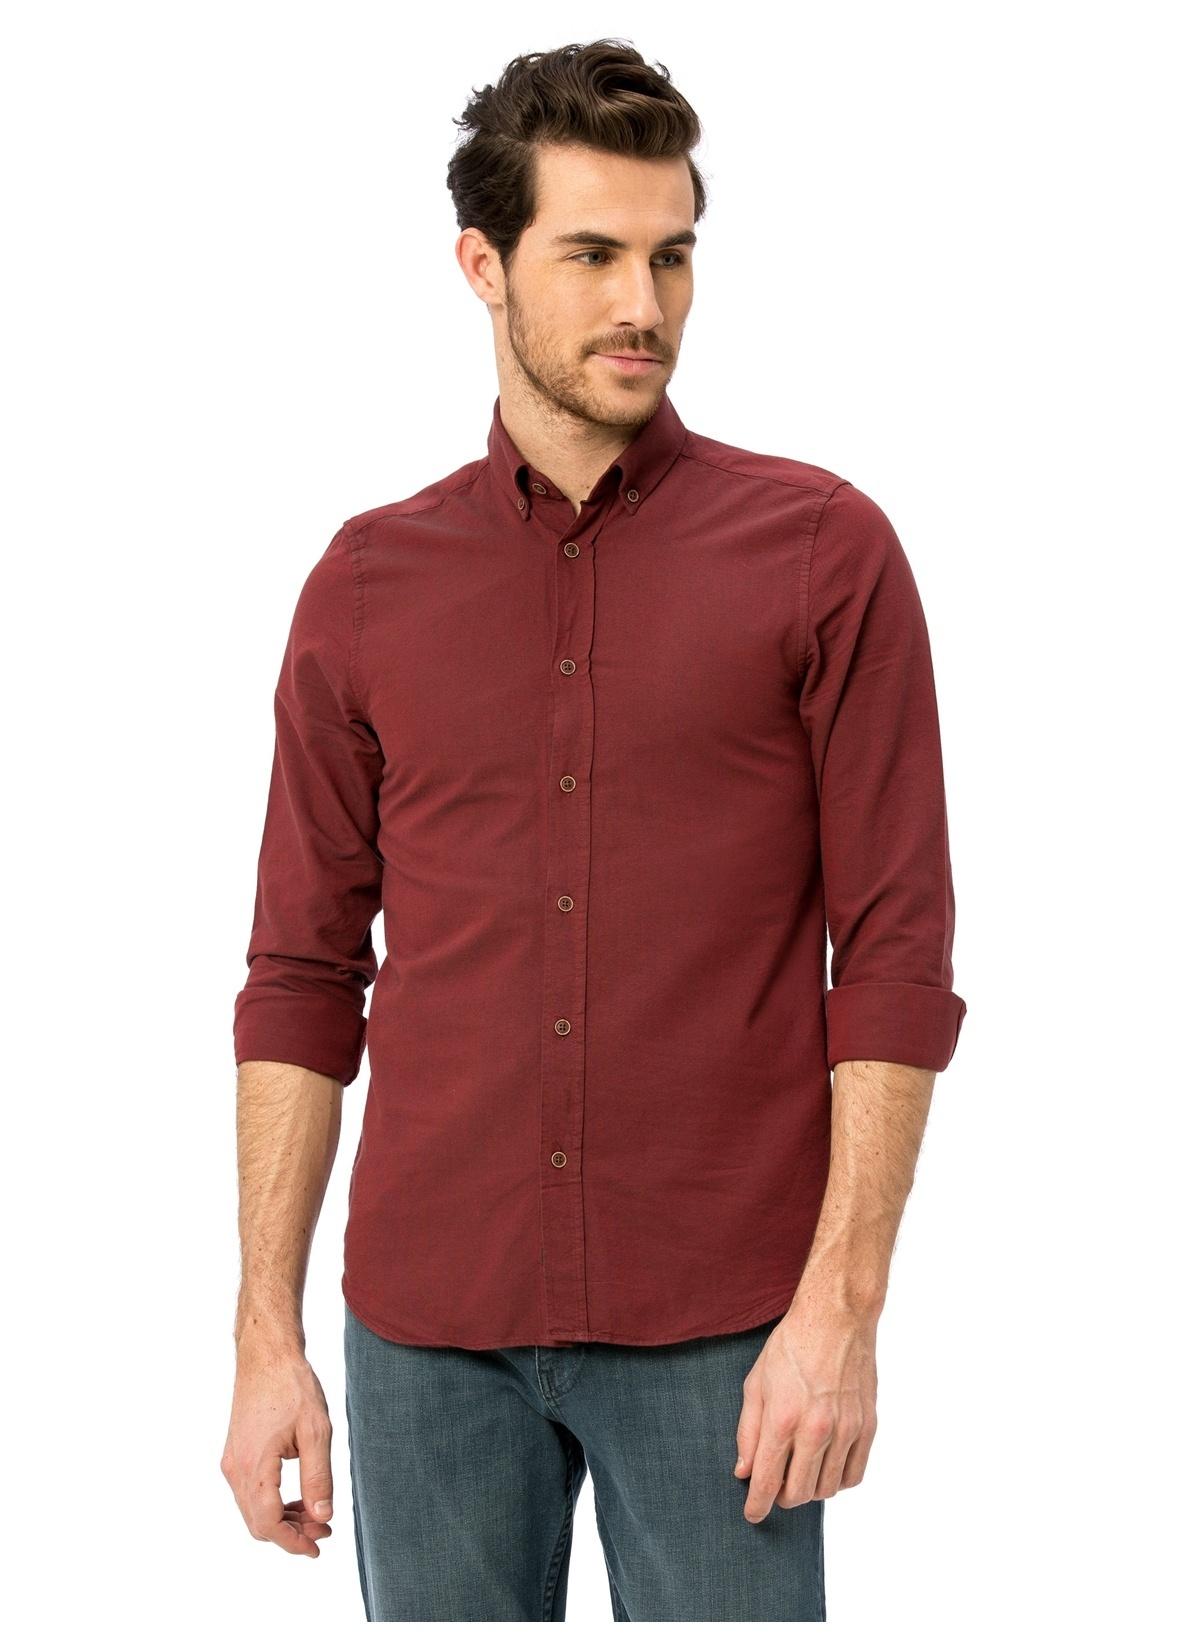 Lc Waikiki Slim Fit Uzun Kollu Gömlek 8s0227z8 Gömlek – 59.99 TL